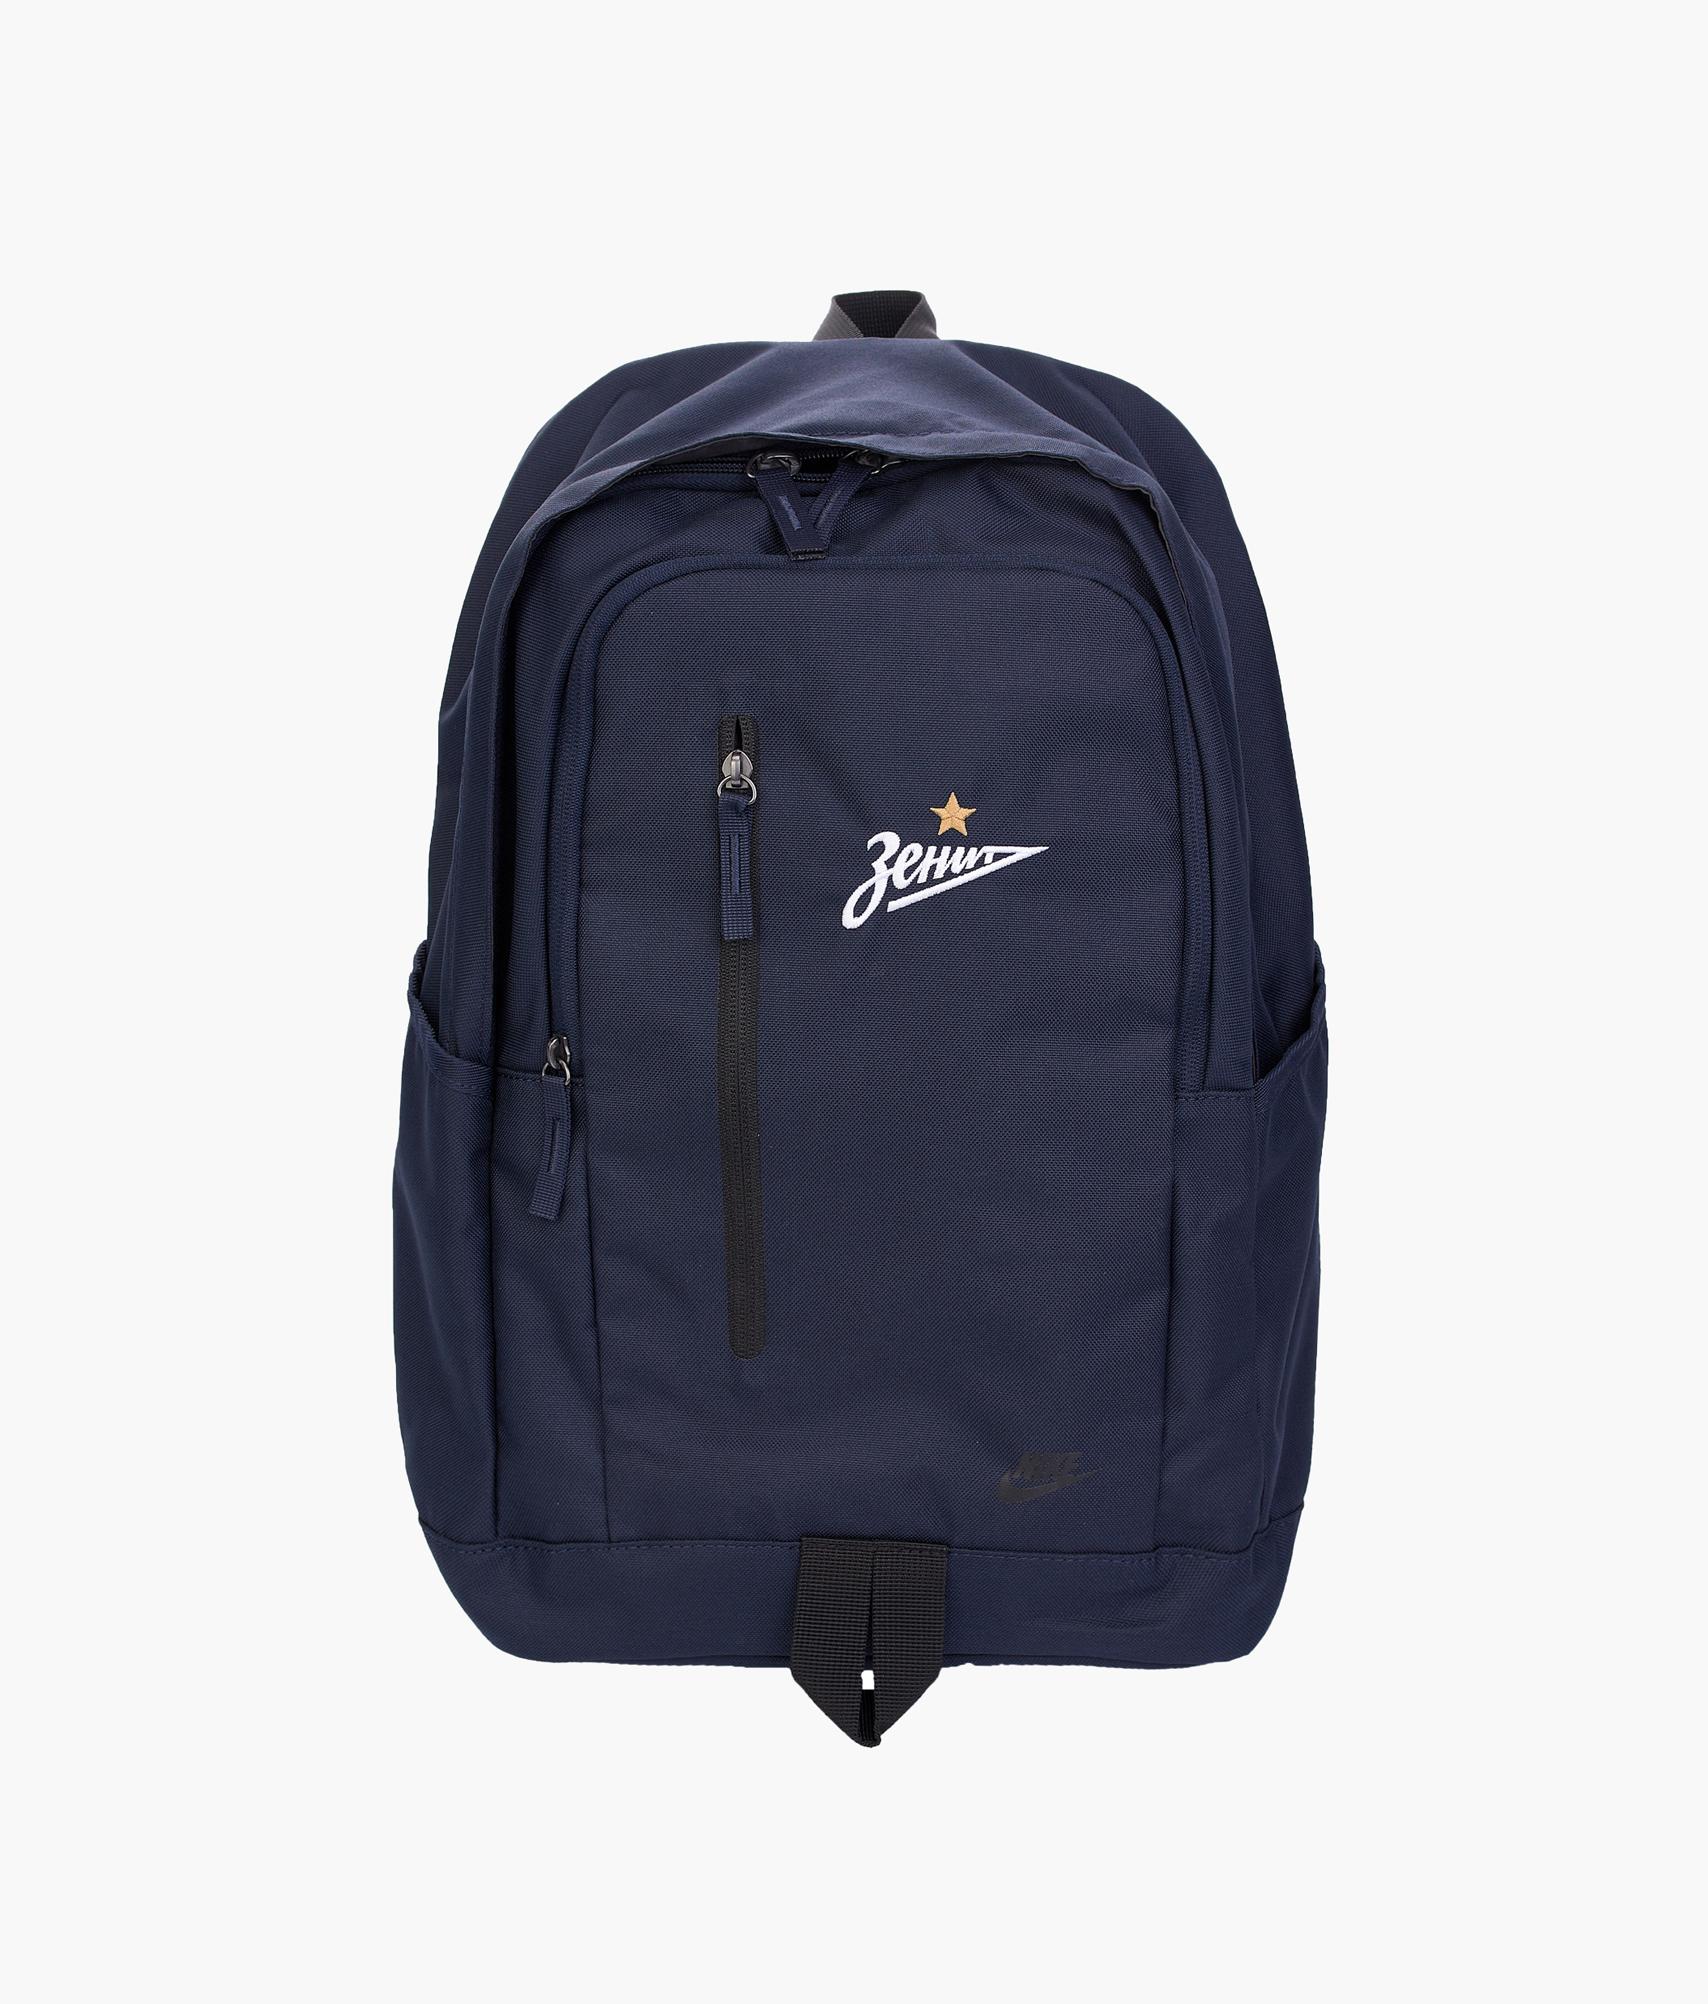 Рюкзак Nike Nike Цвет-Темно-Синий рюкзак nike nike ni464bghusy0